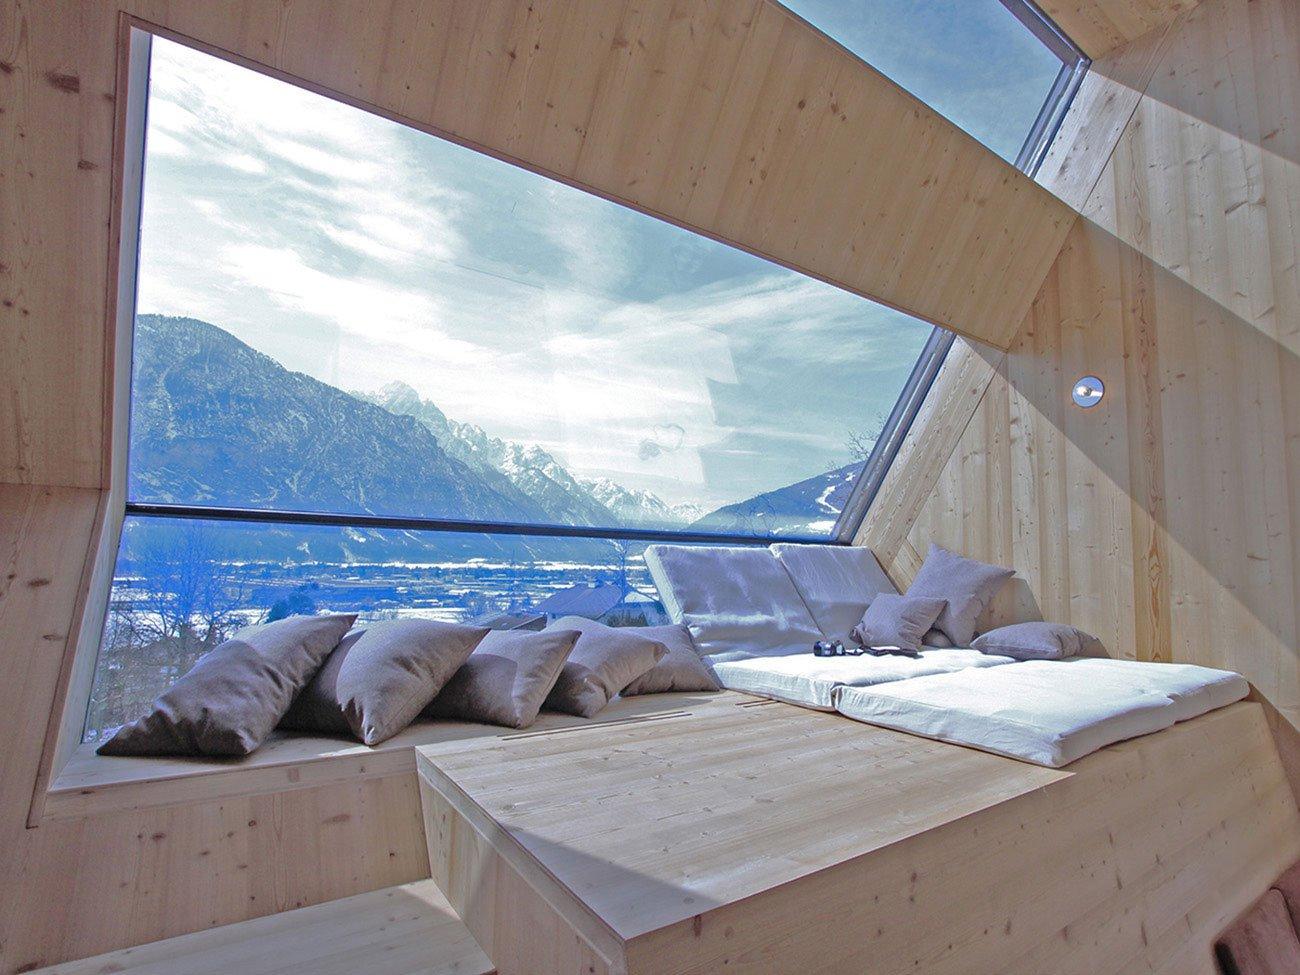 The Ufogel: Small Mountain Retrait in Tyrol